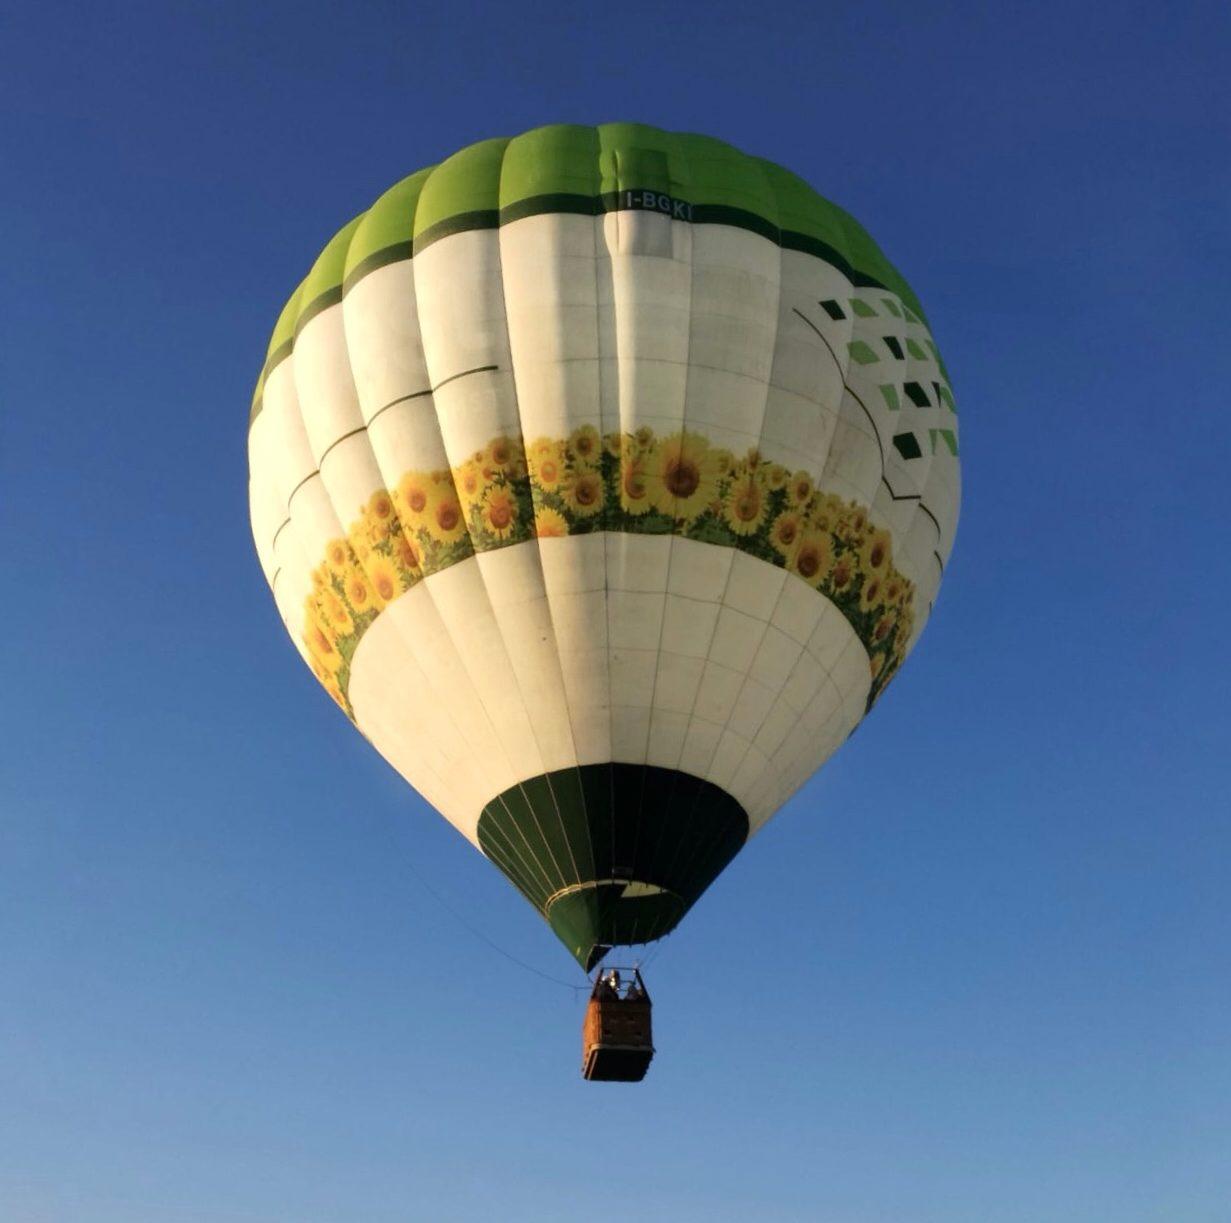 Volo in mongolfiera a Roma